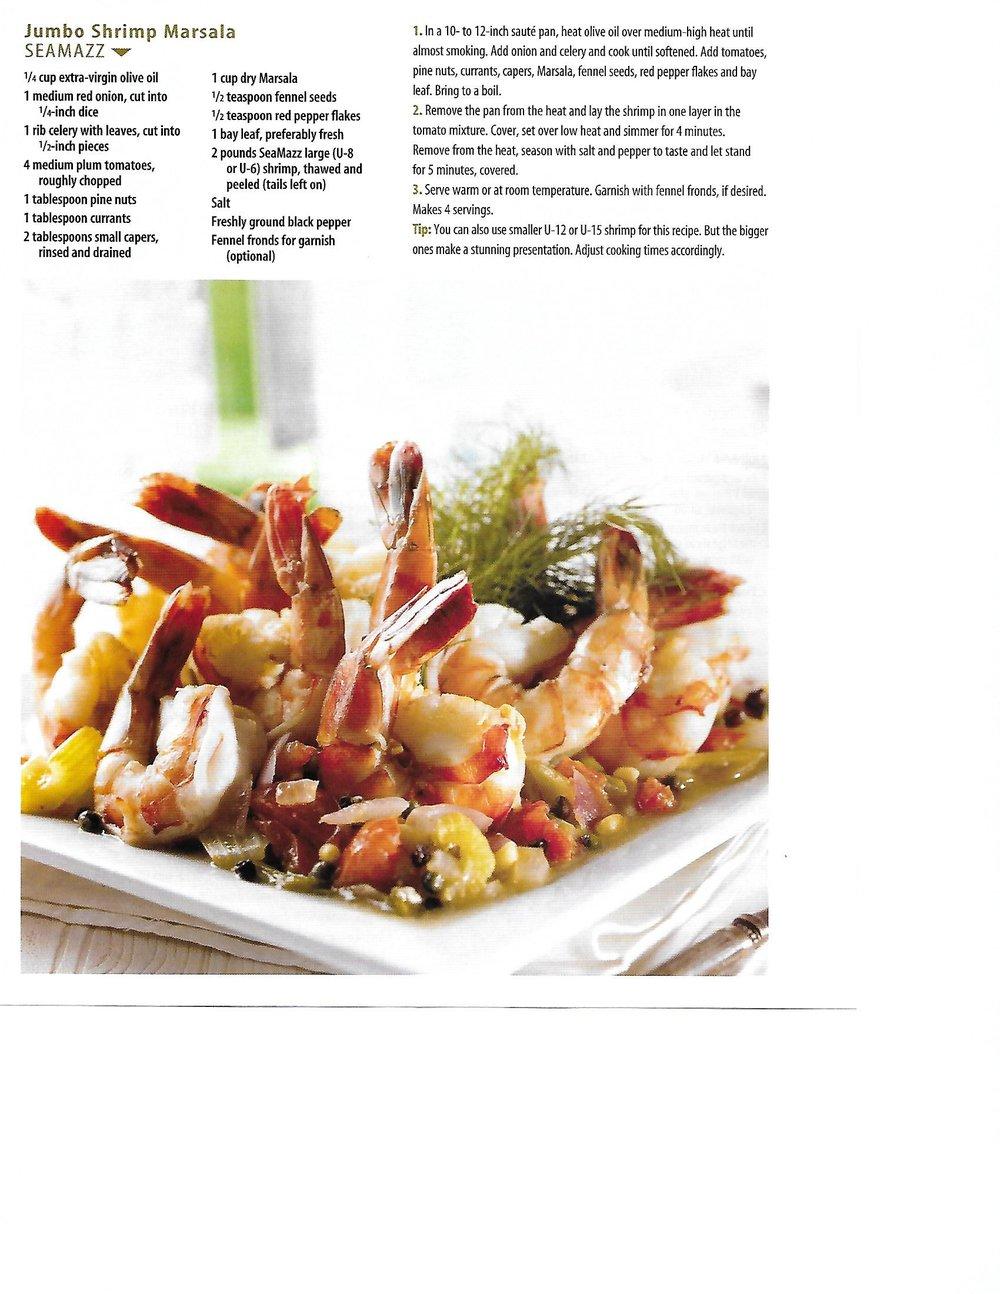 Costco Shrimp 2.jpg